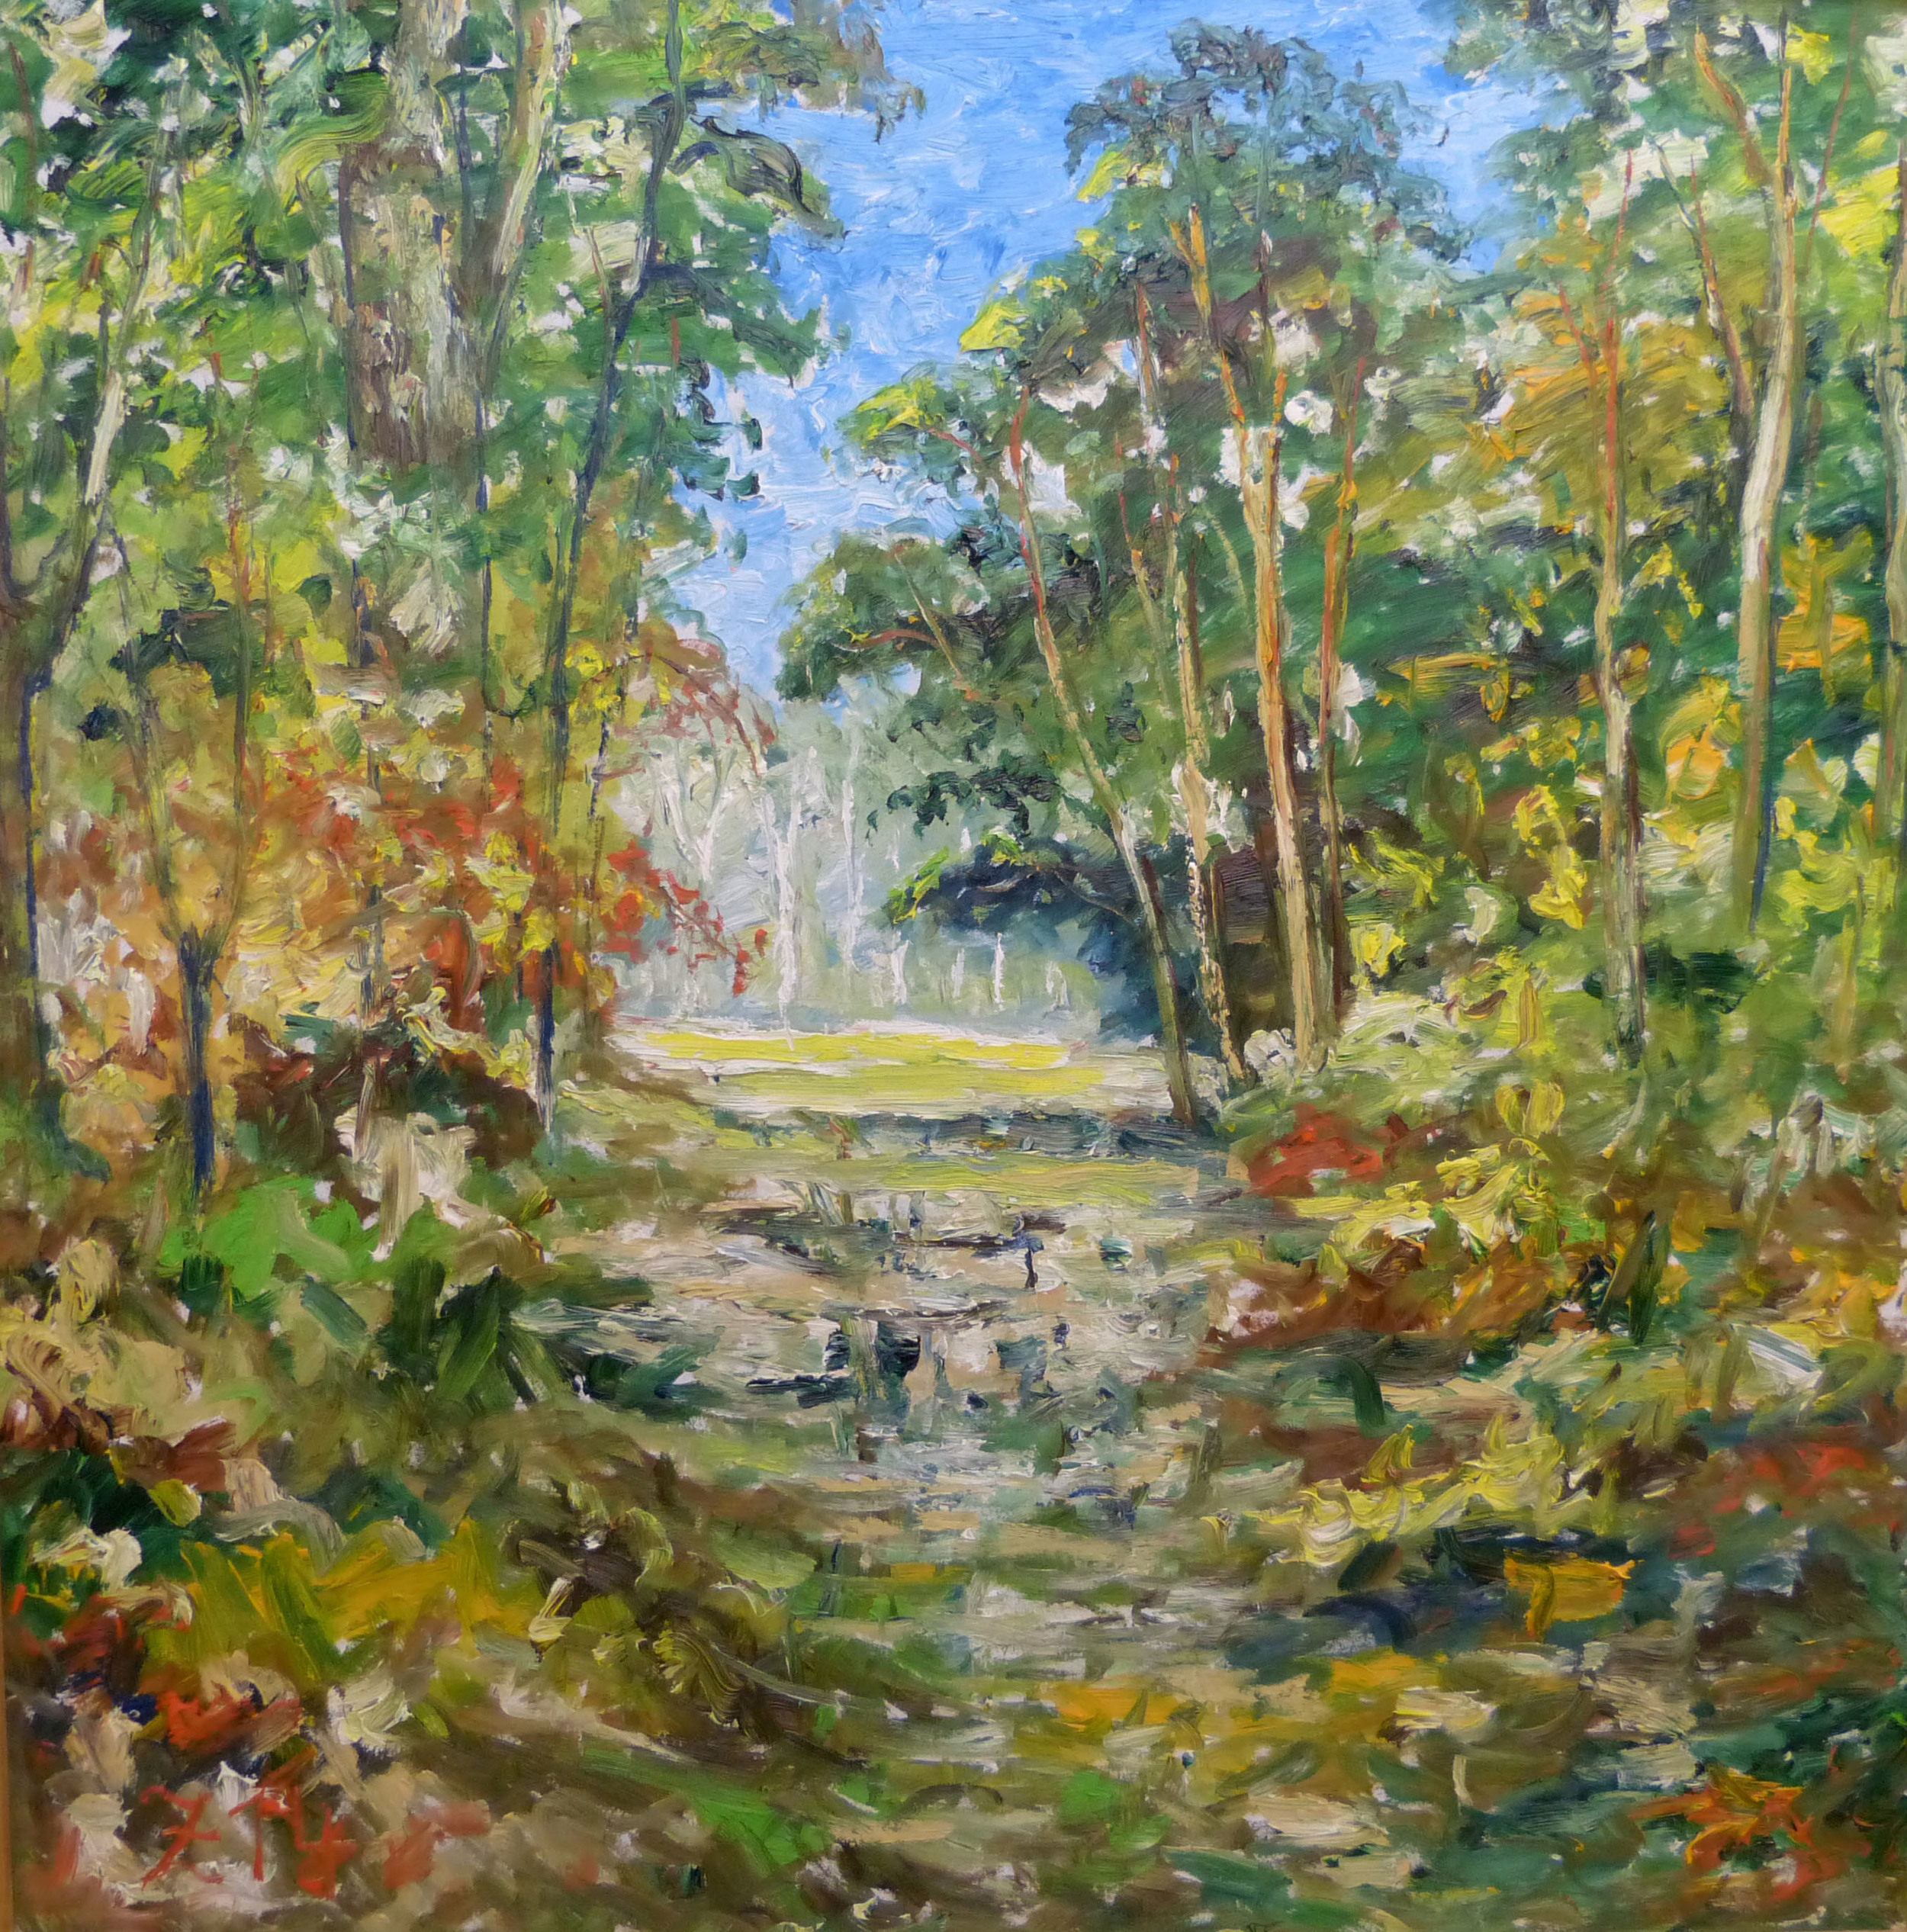 75 Idyllic Forest